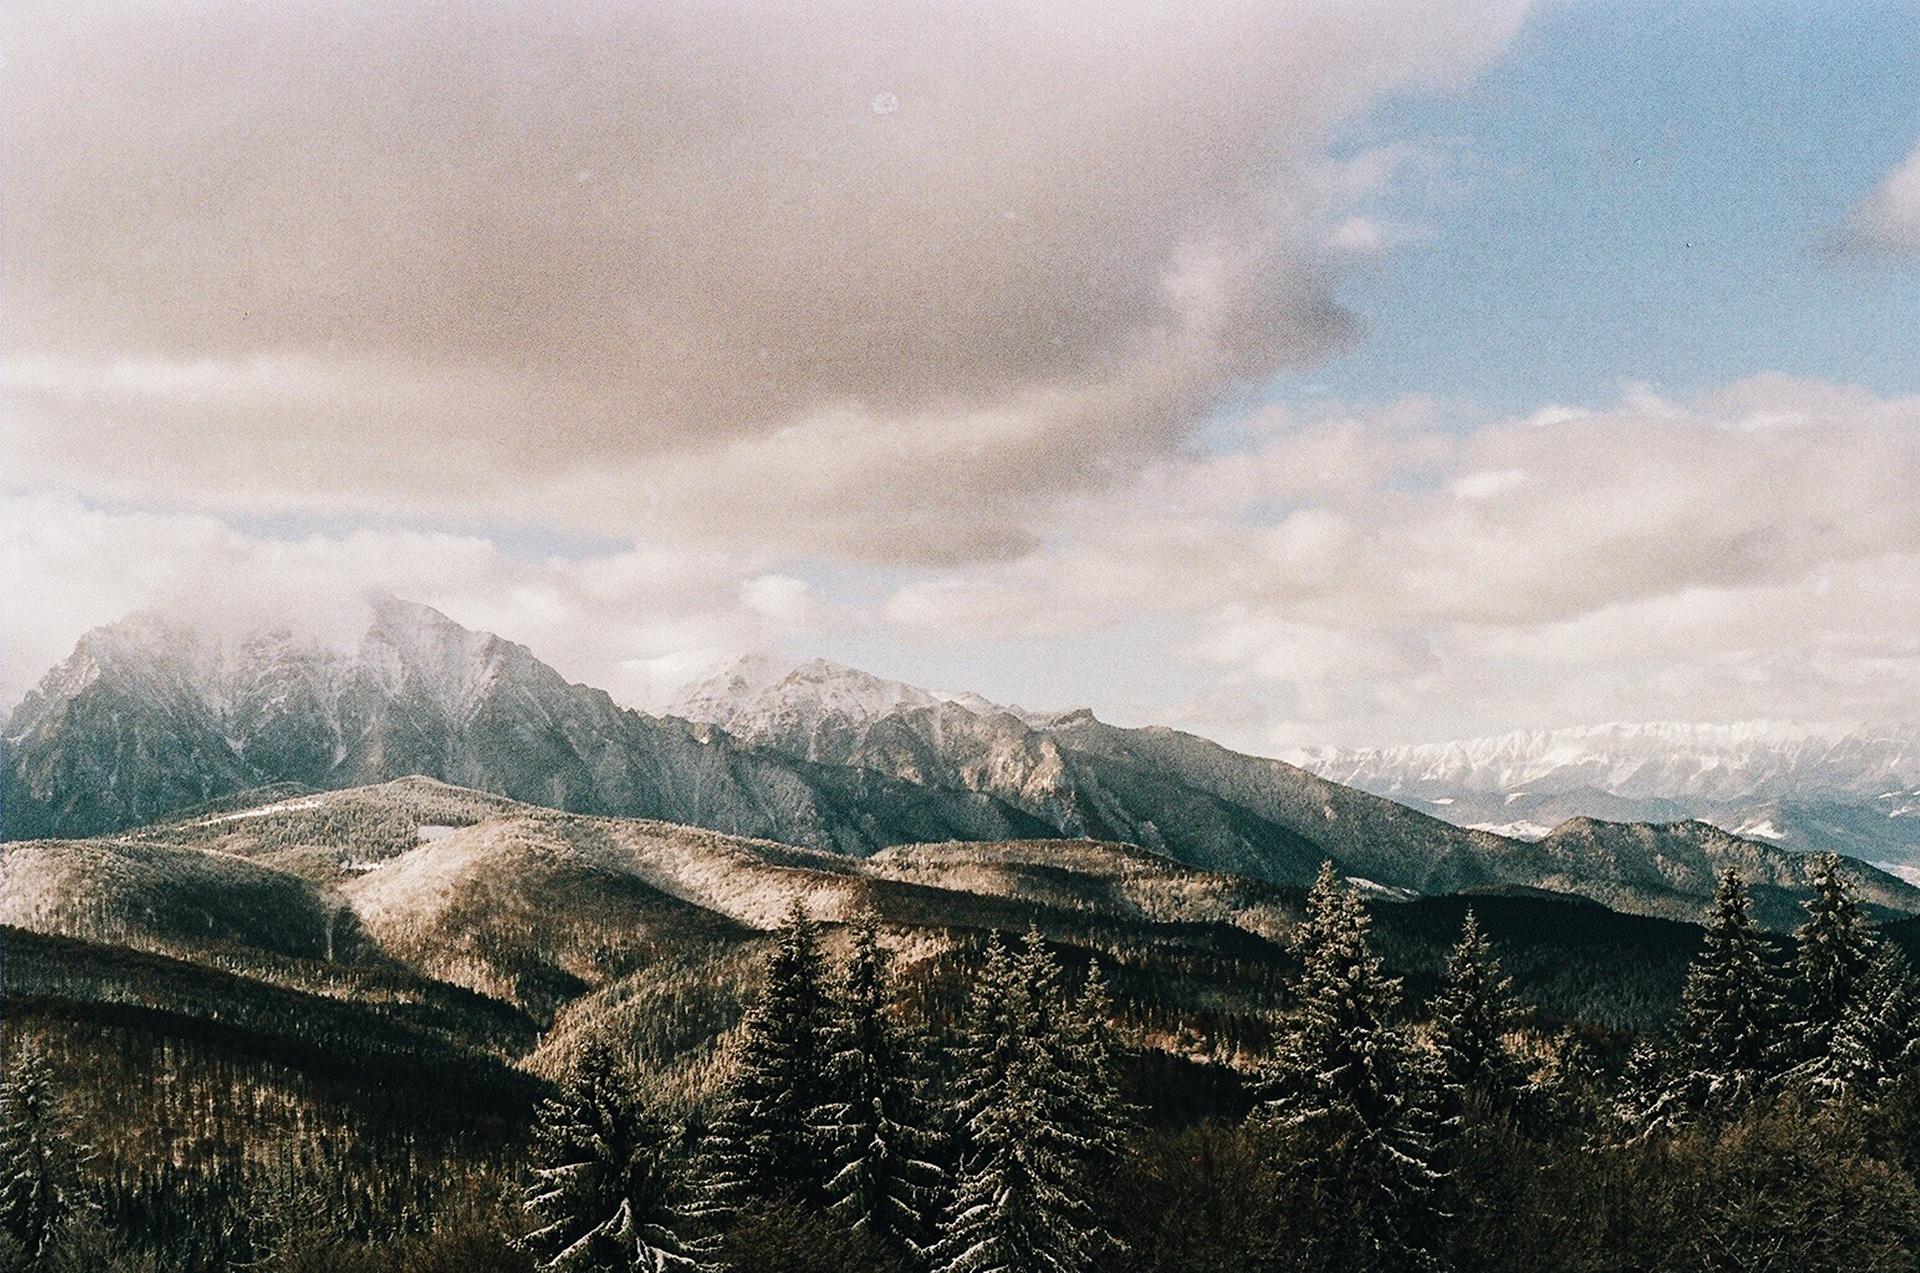 Unde ieşim la munte? - Trasee montane din judetul Mures si imprejurimi